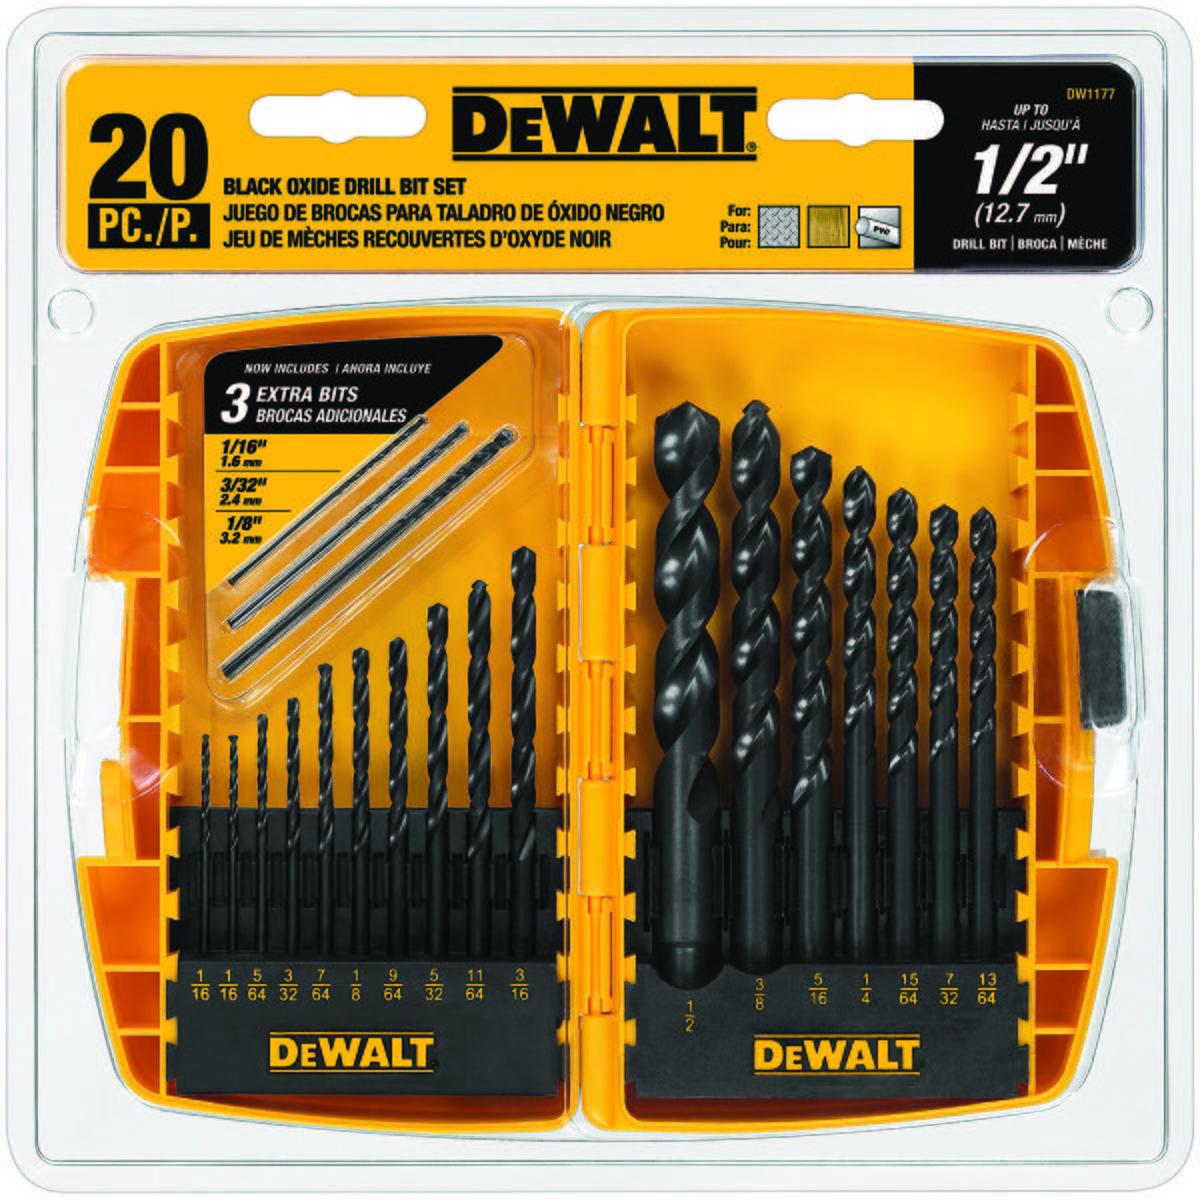 20pc Black Oxide Metal Drilling Set